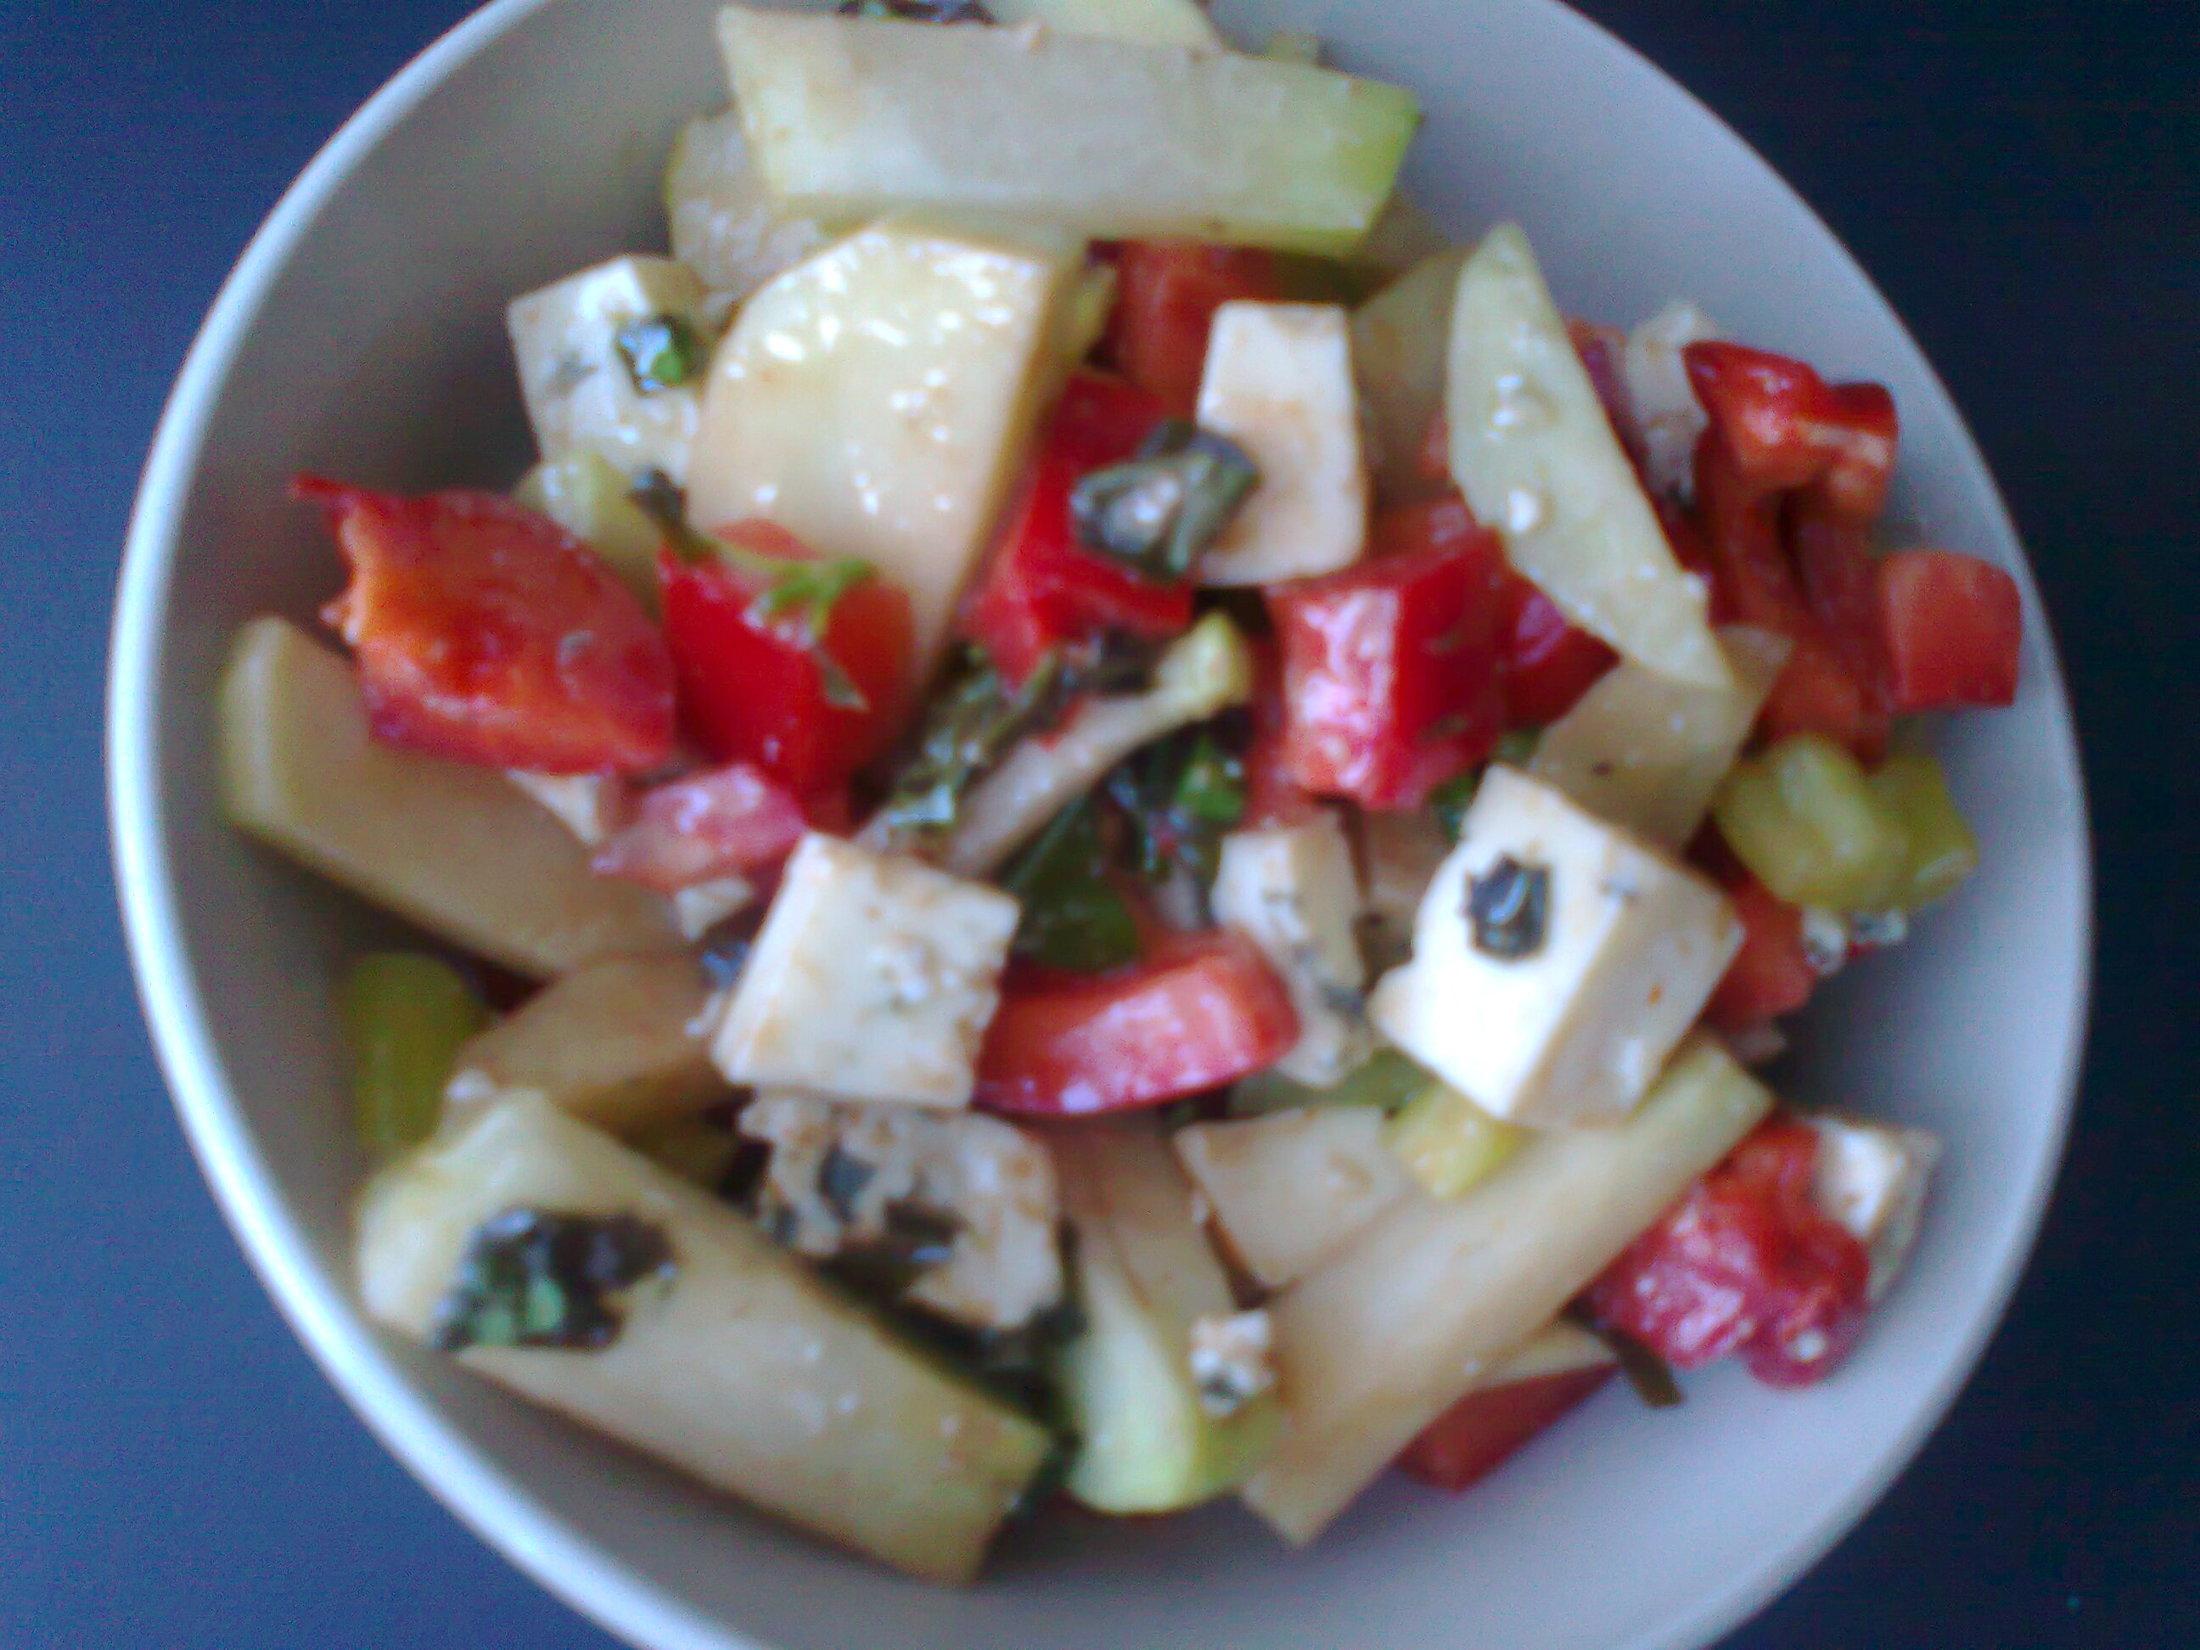 Kedlubnový salát s paprikou